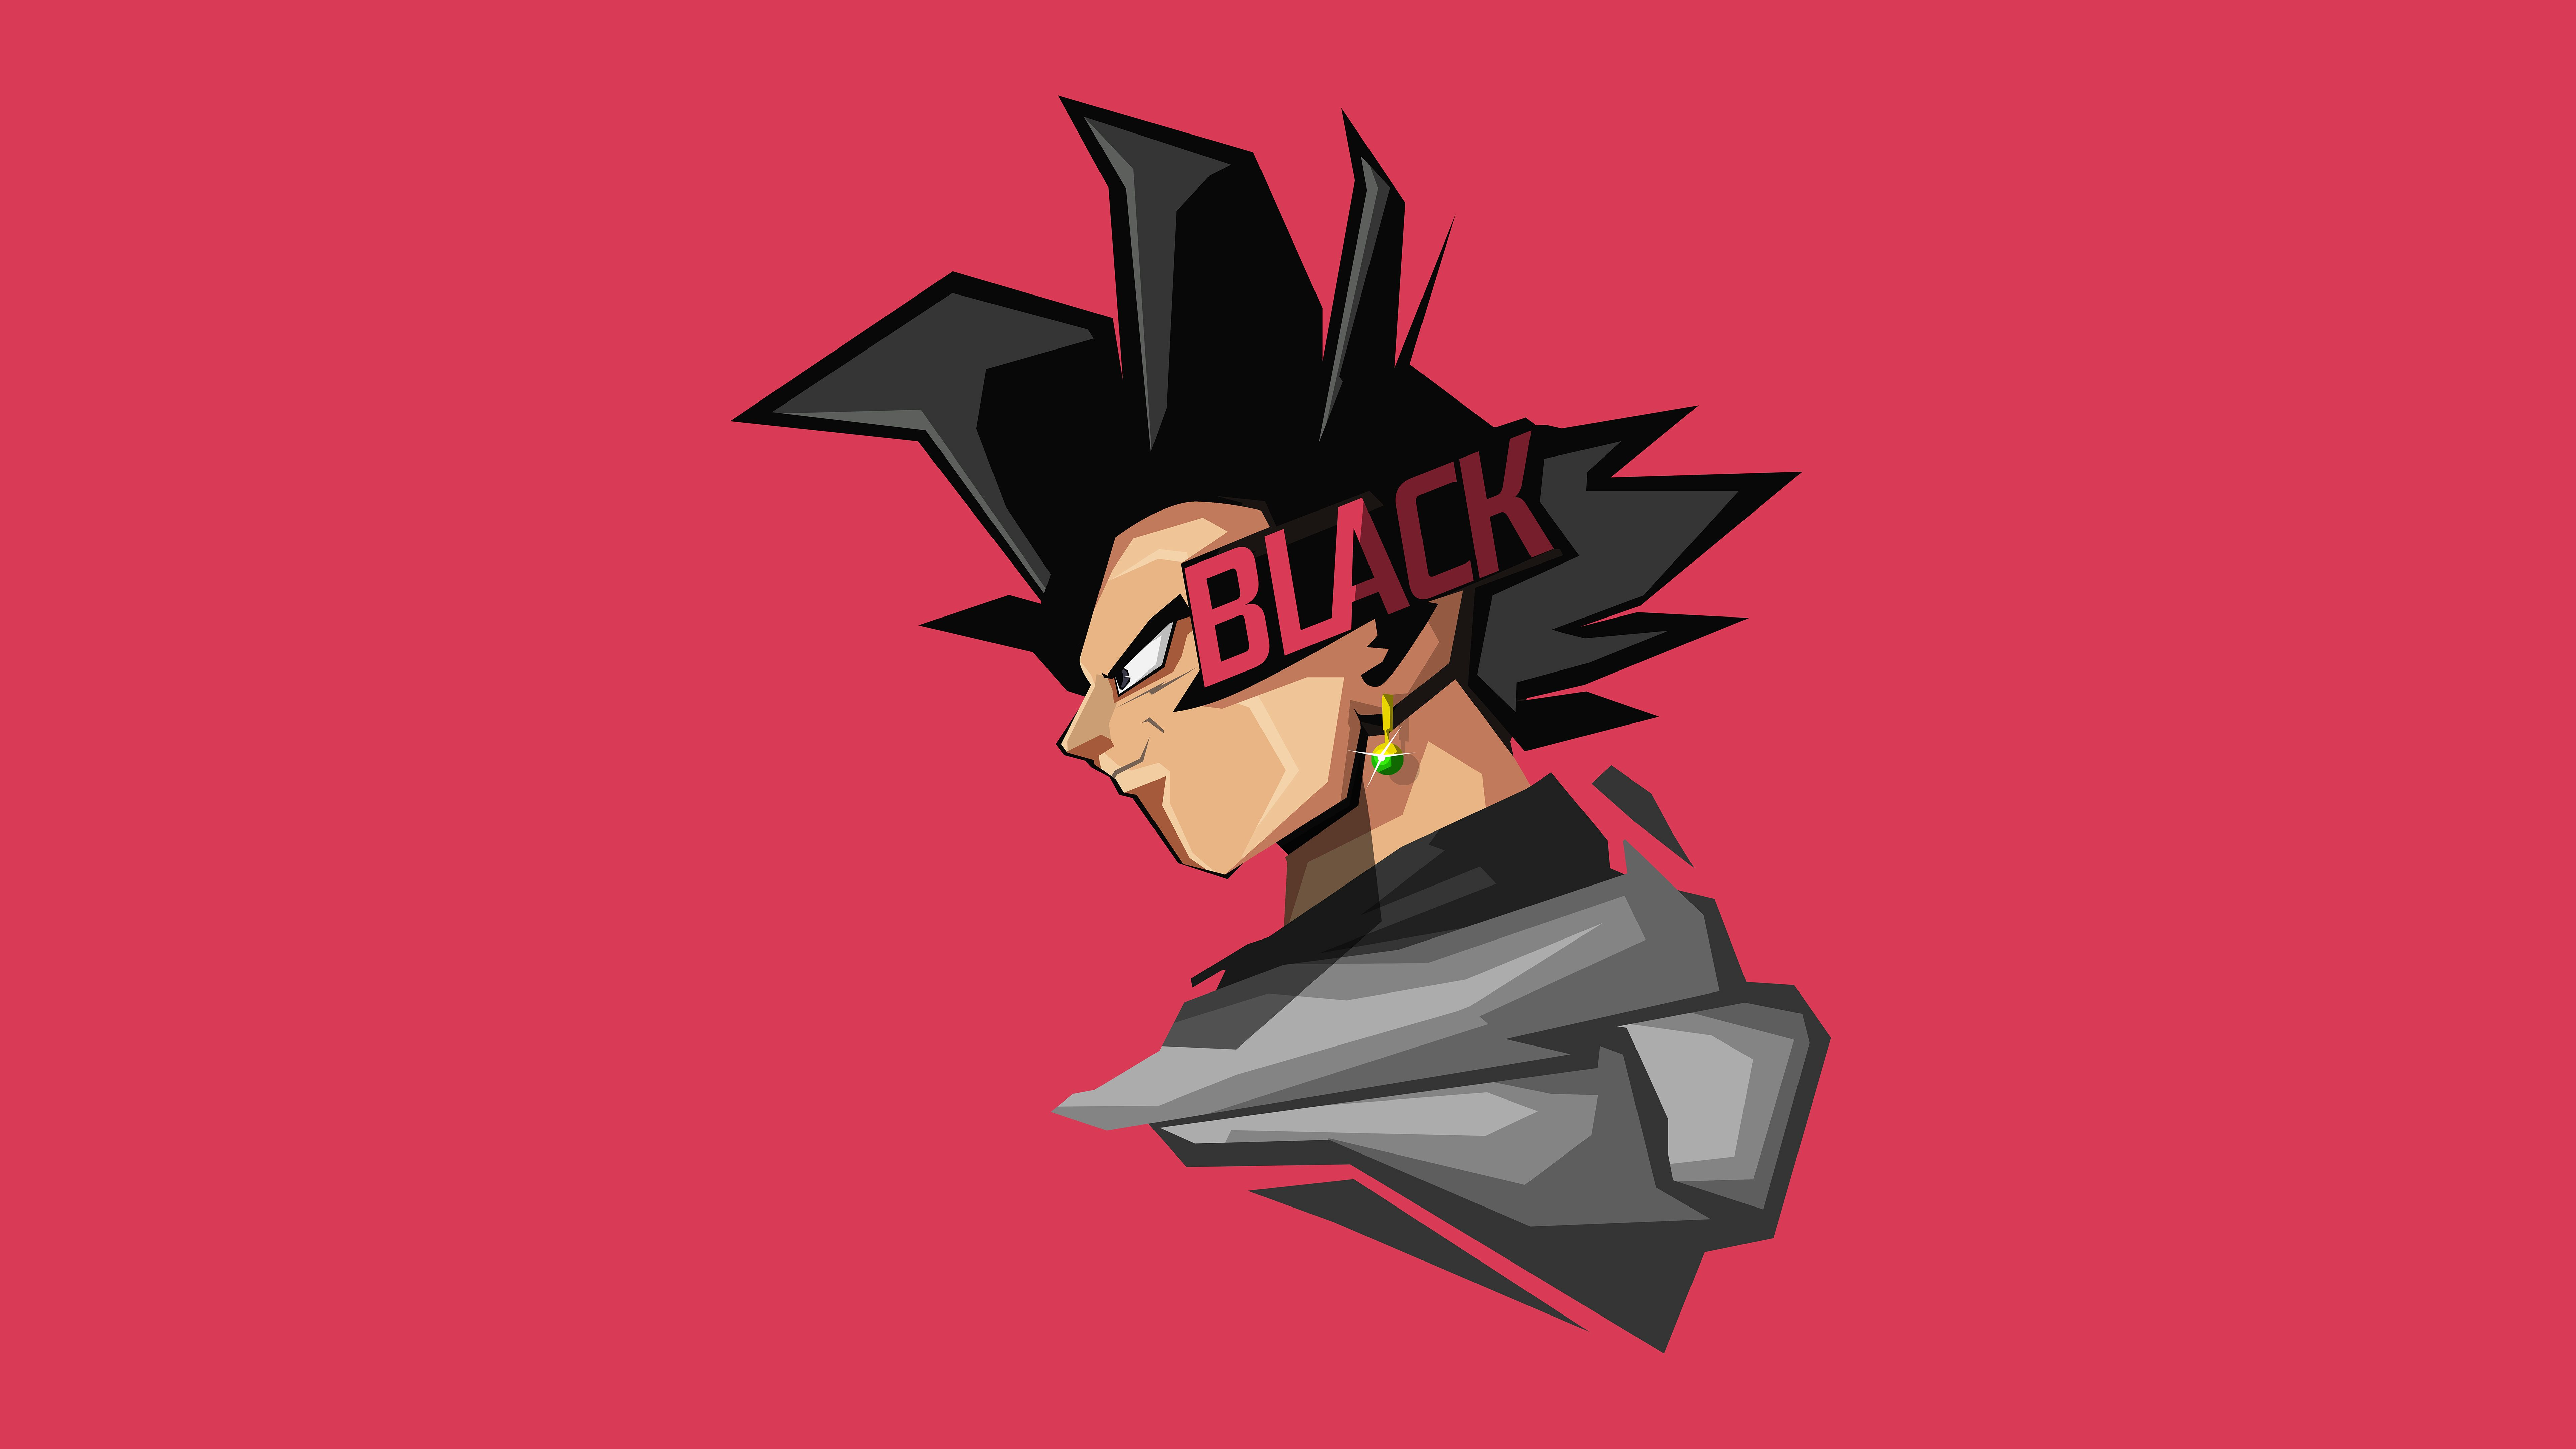 Goku Black Minimal Artwork 4k 8k Anime Wallpaper Goku Black Hd Anime Wallpapers